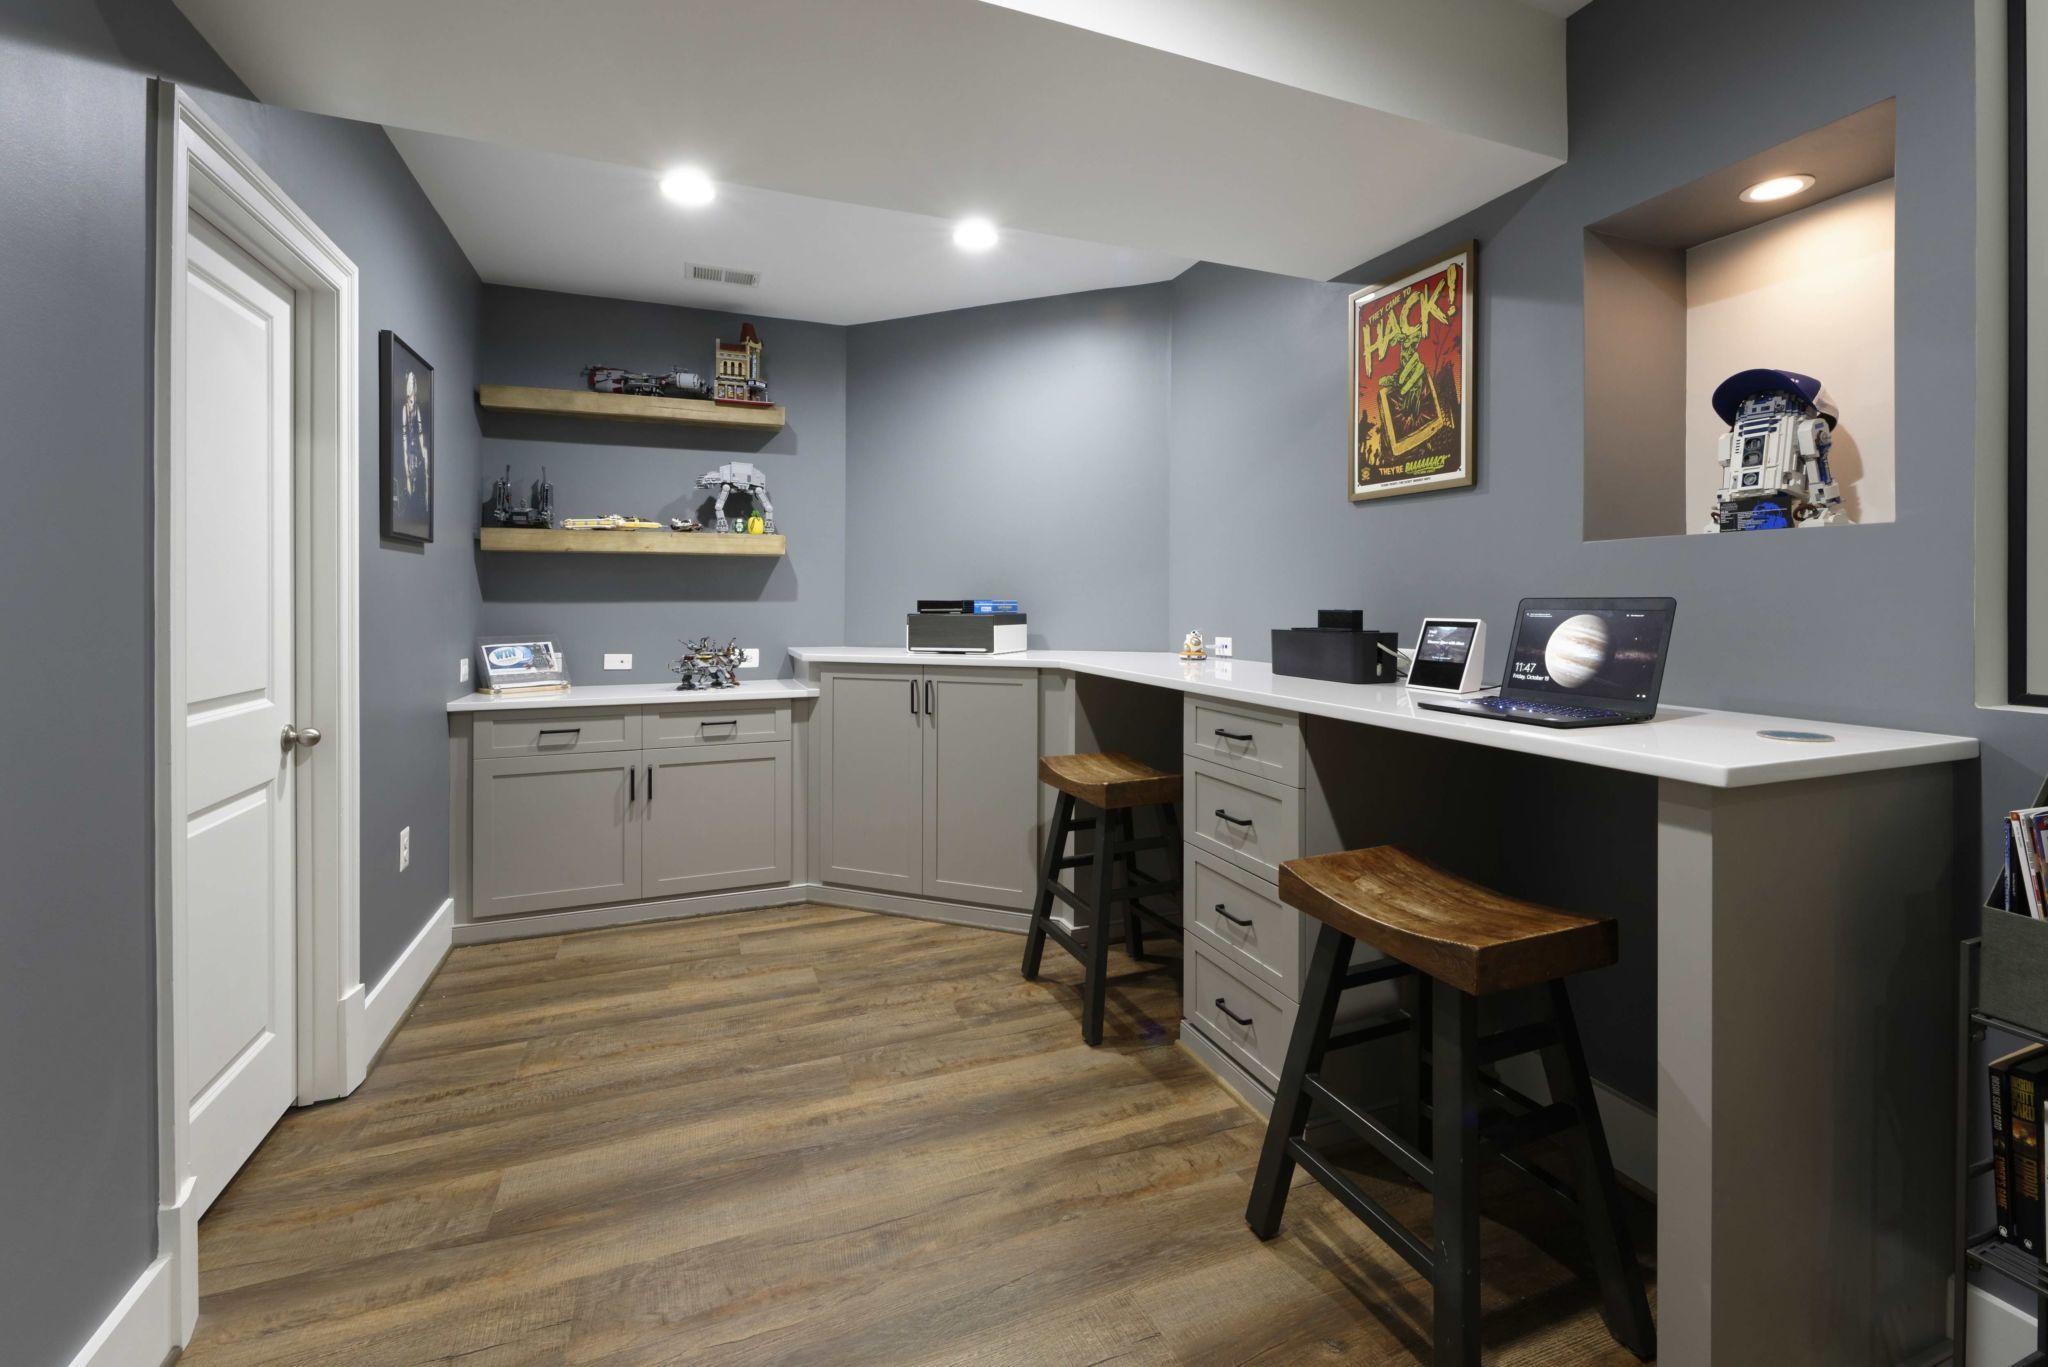 Basement creative lab in 2020 Finishing basement, Large